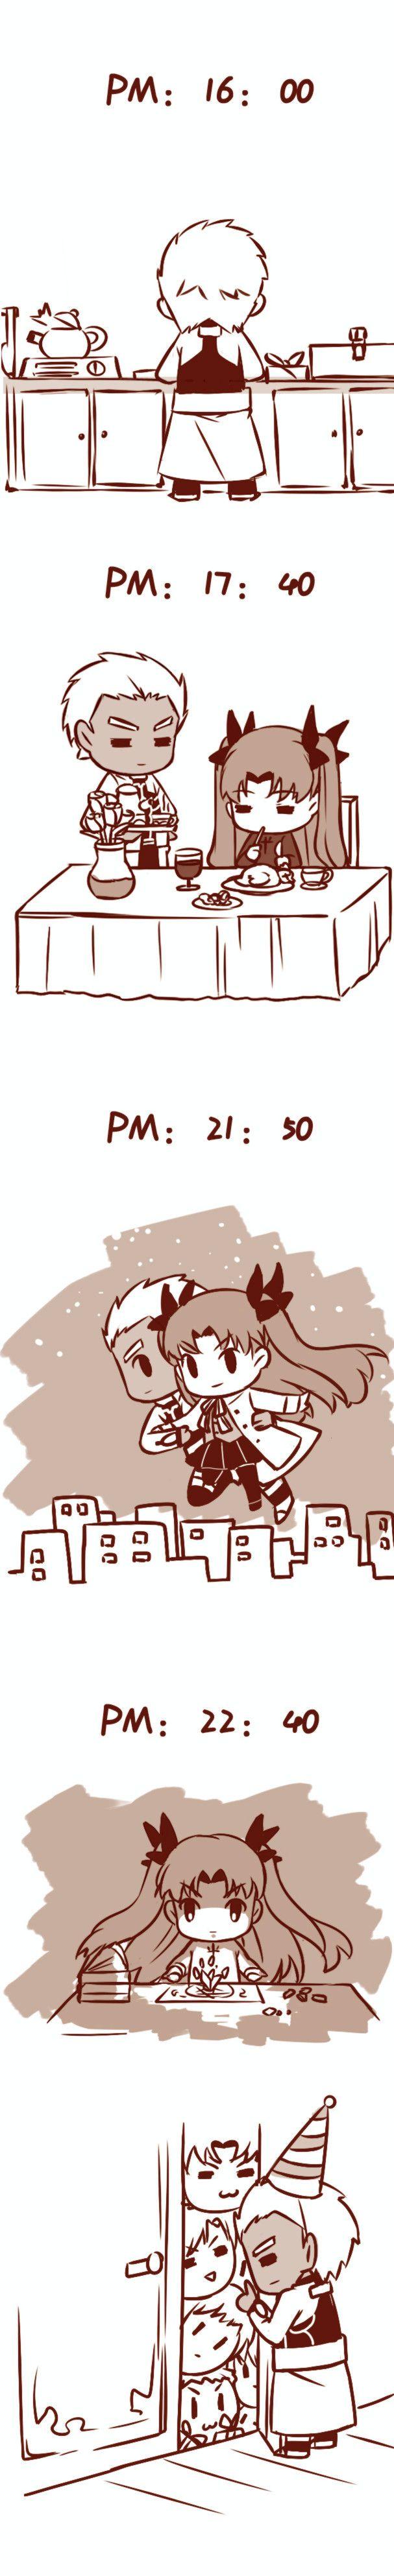 Fate/ Stay Night Archer x Rin Doujinshi - Fate/ Stay Night Archer x Rin Doujinshi Chap 3